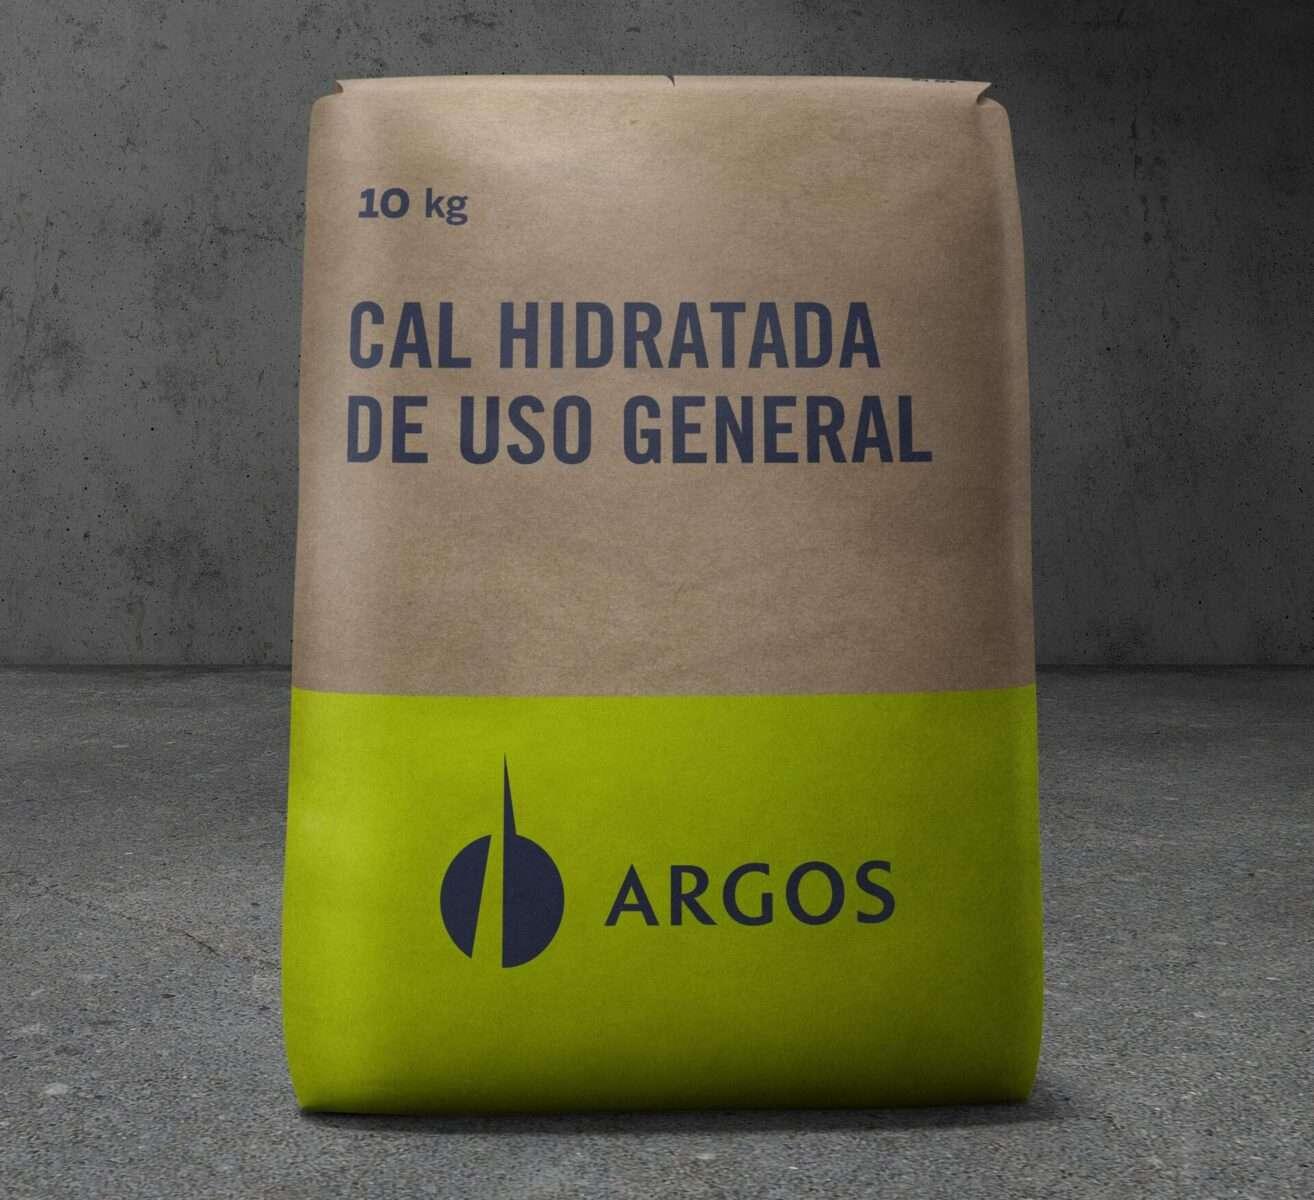 Cal Hidratada Argos